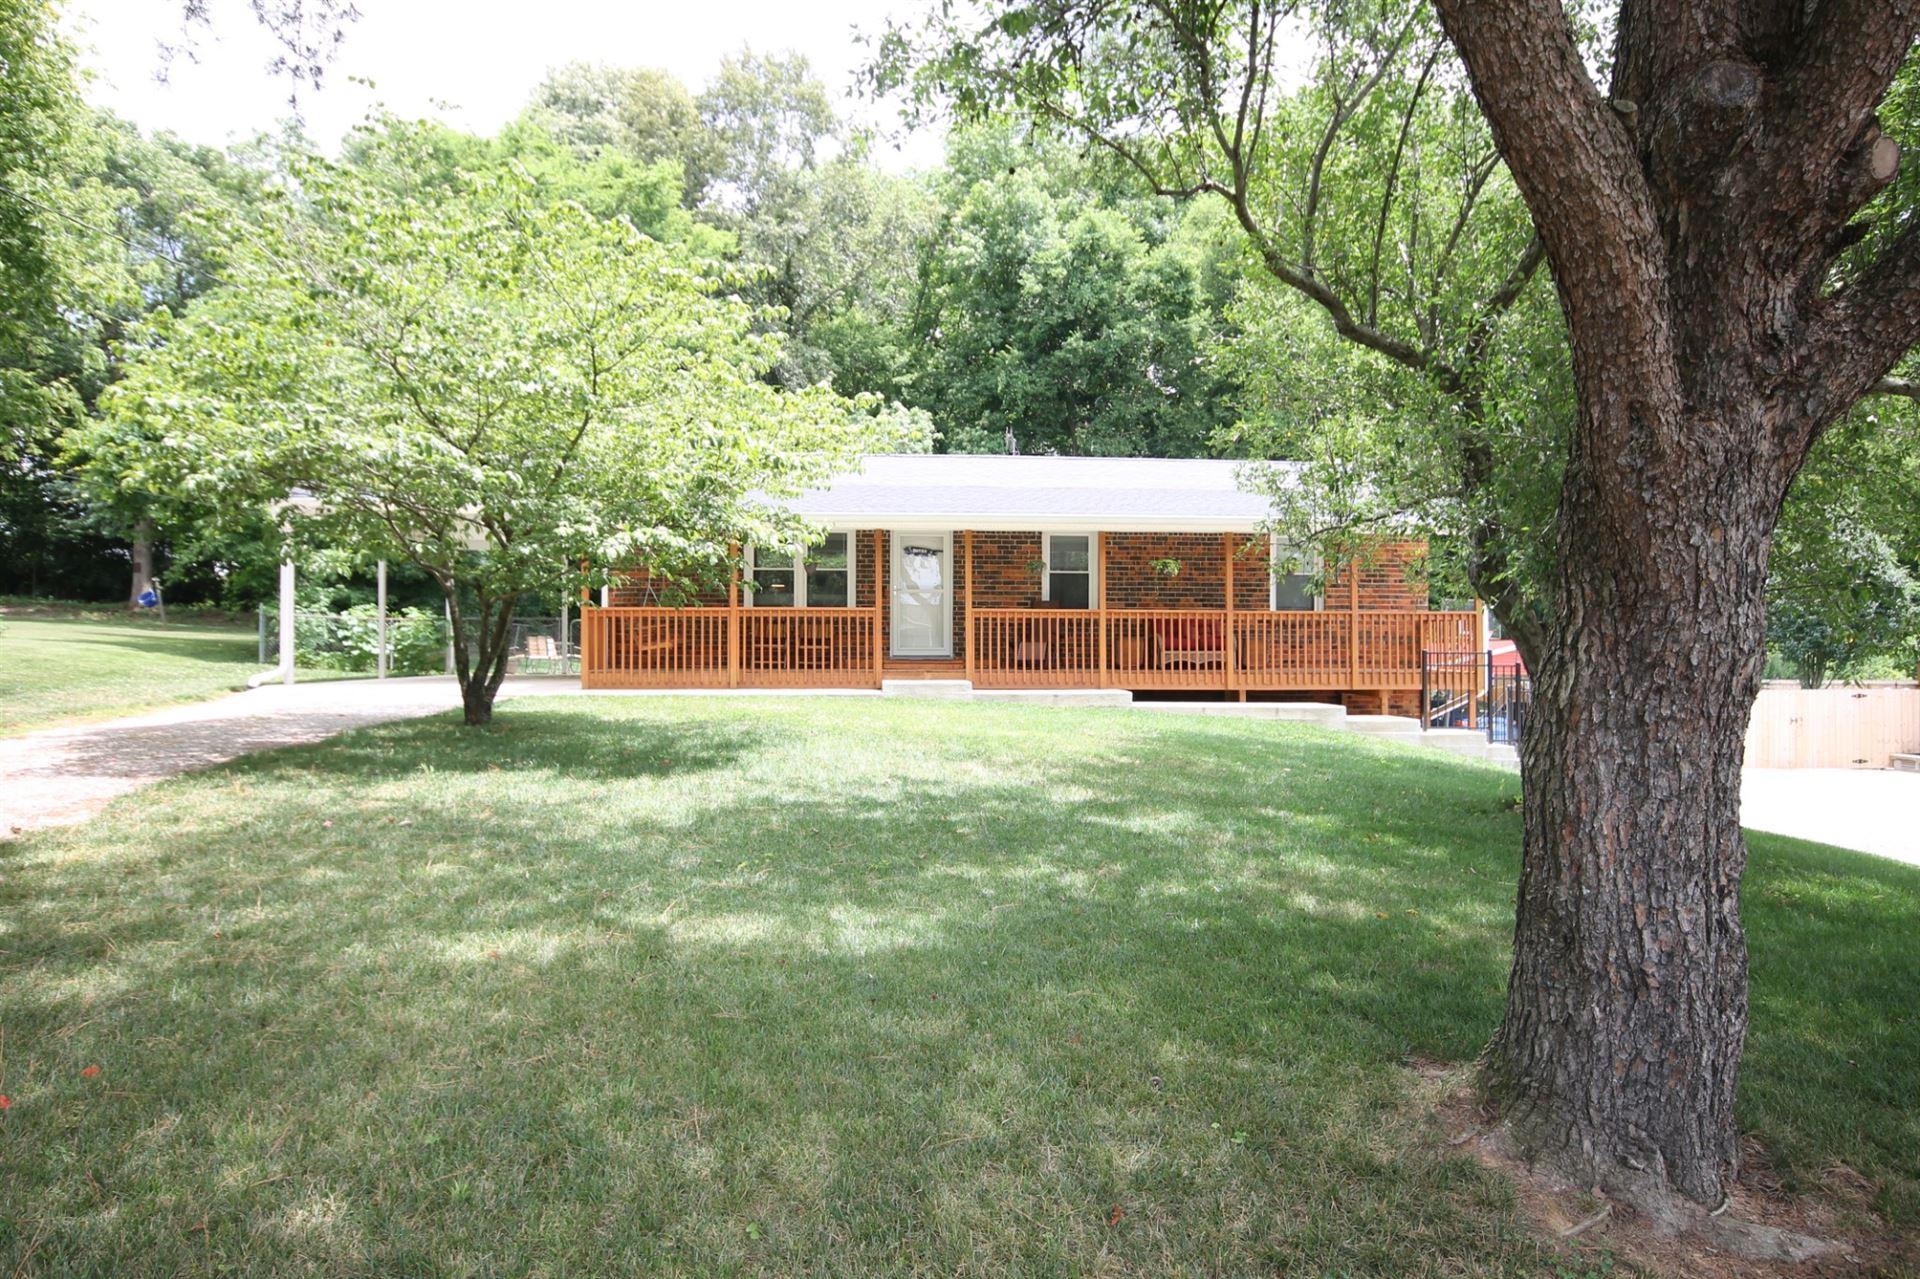 109 Lakeside Dr, Columbia, TN 38401 - MLS#: 2294065